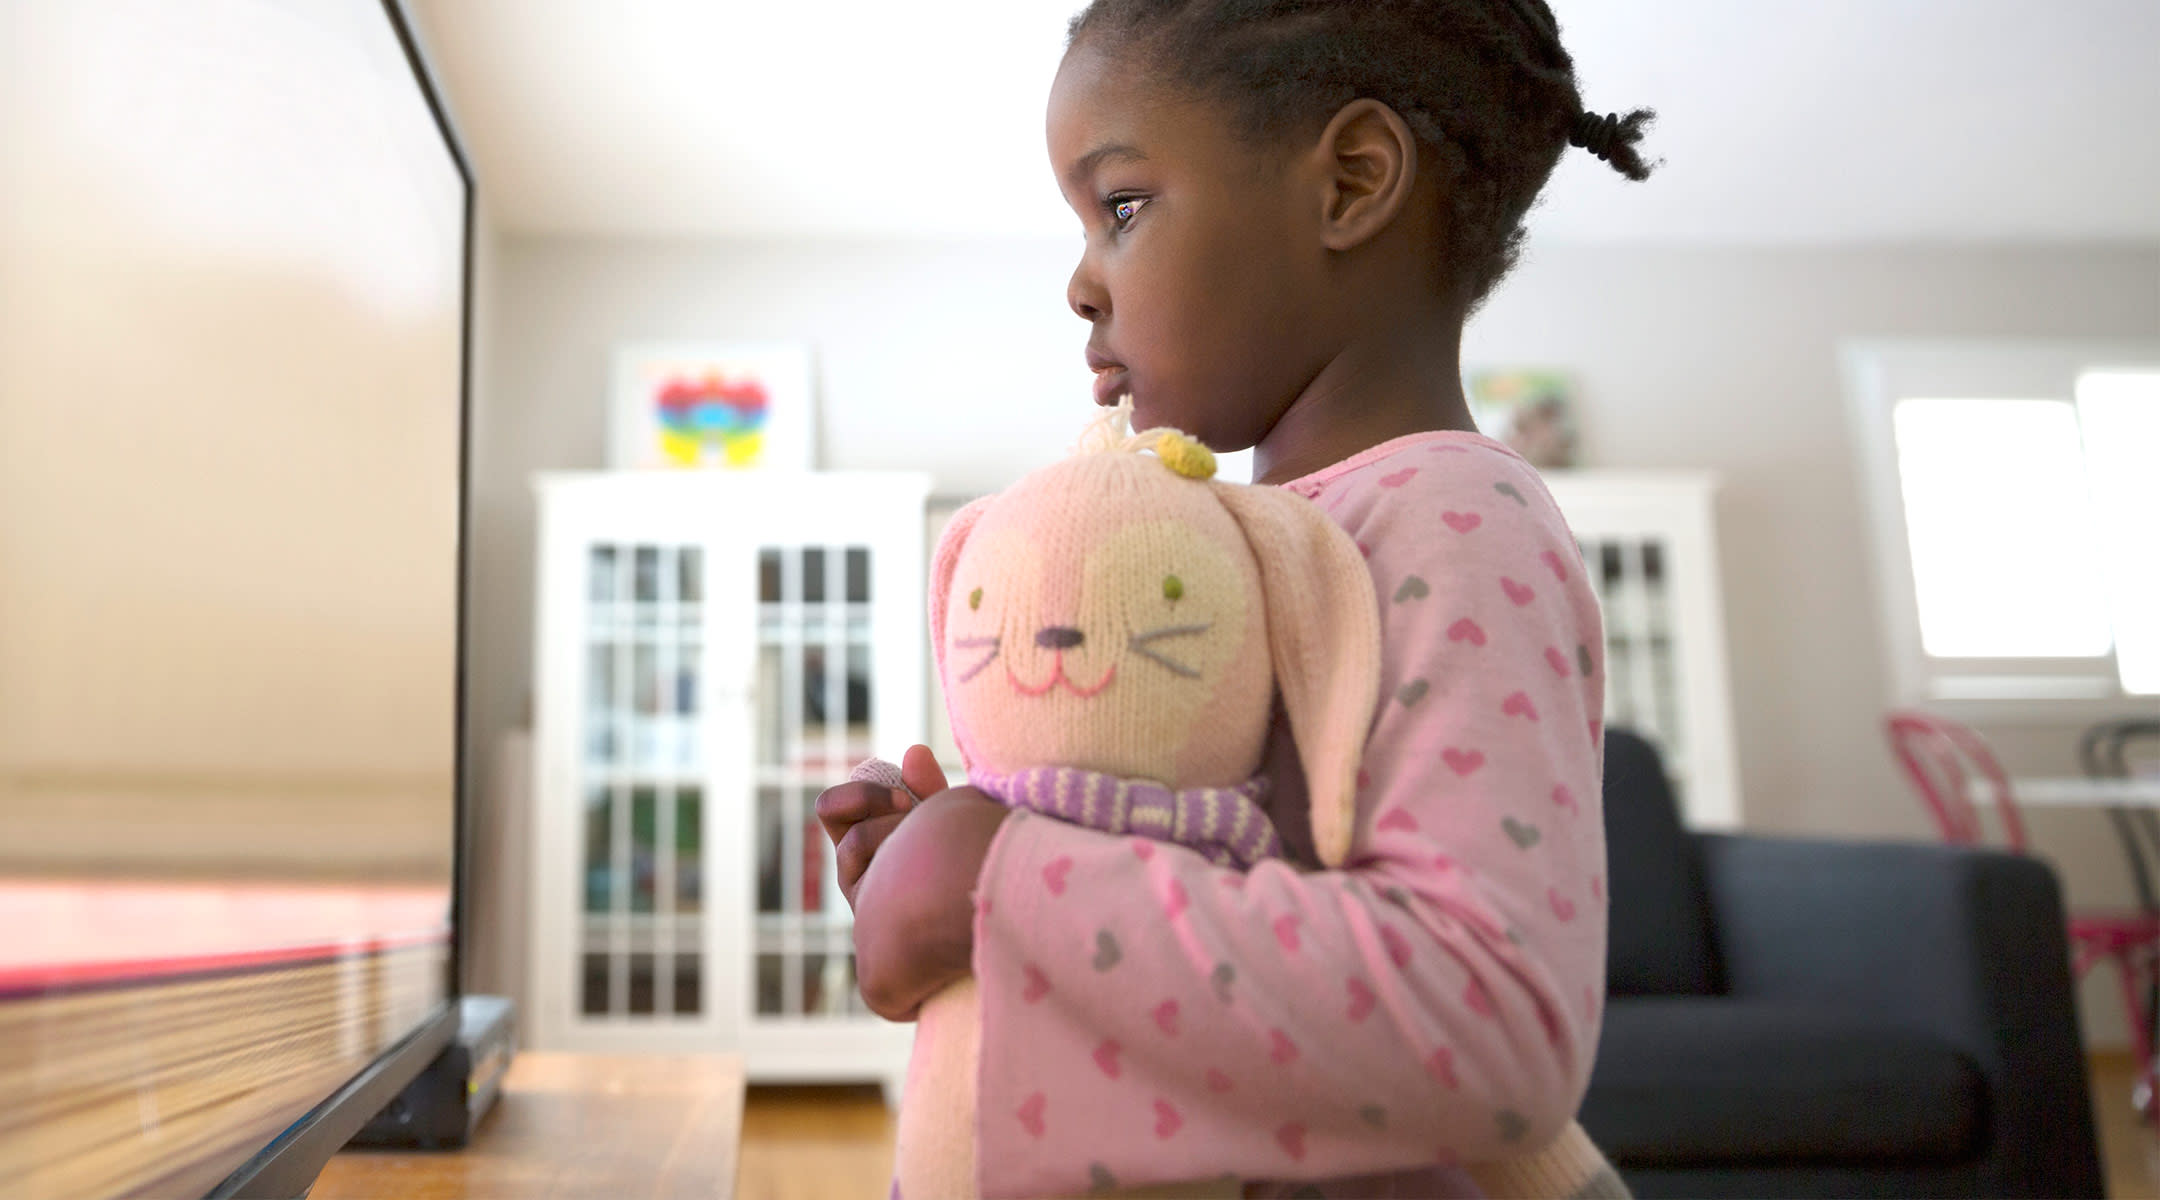 preschool age girl standing and watching tv